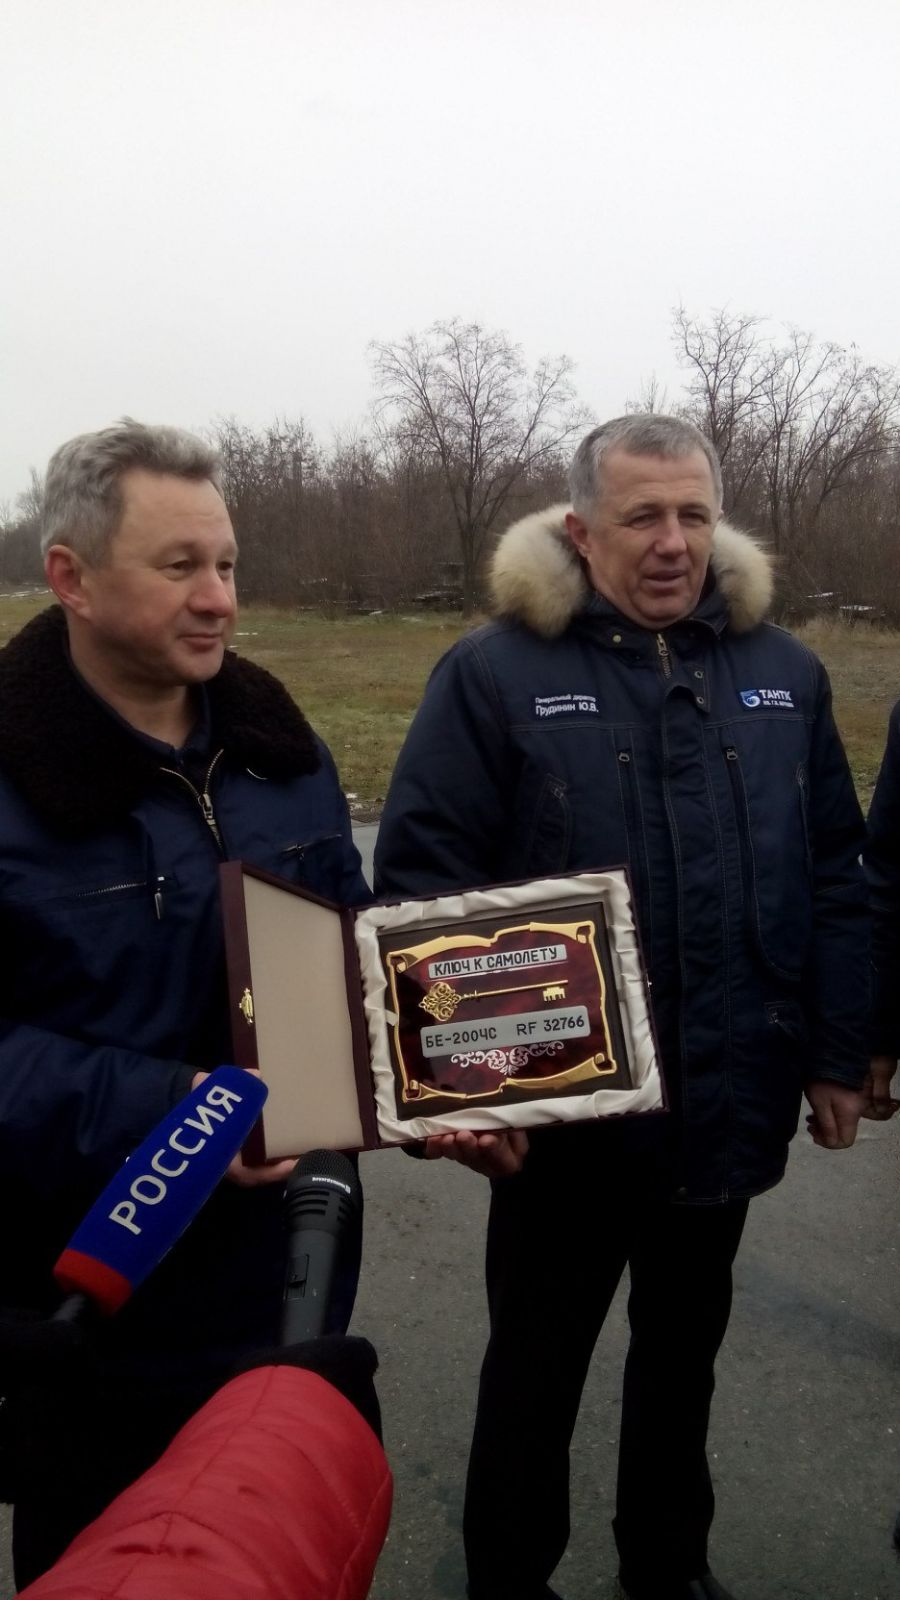 Ключ получает командир звена самолётов Бе-200ЧС авиацентра МЧС ЮРЦ Олег Попов.